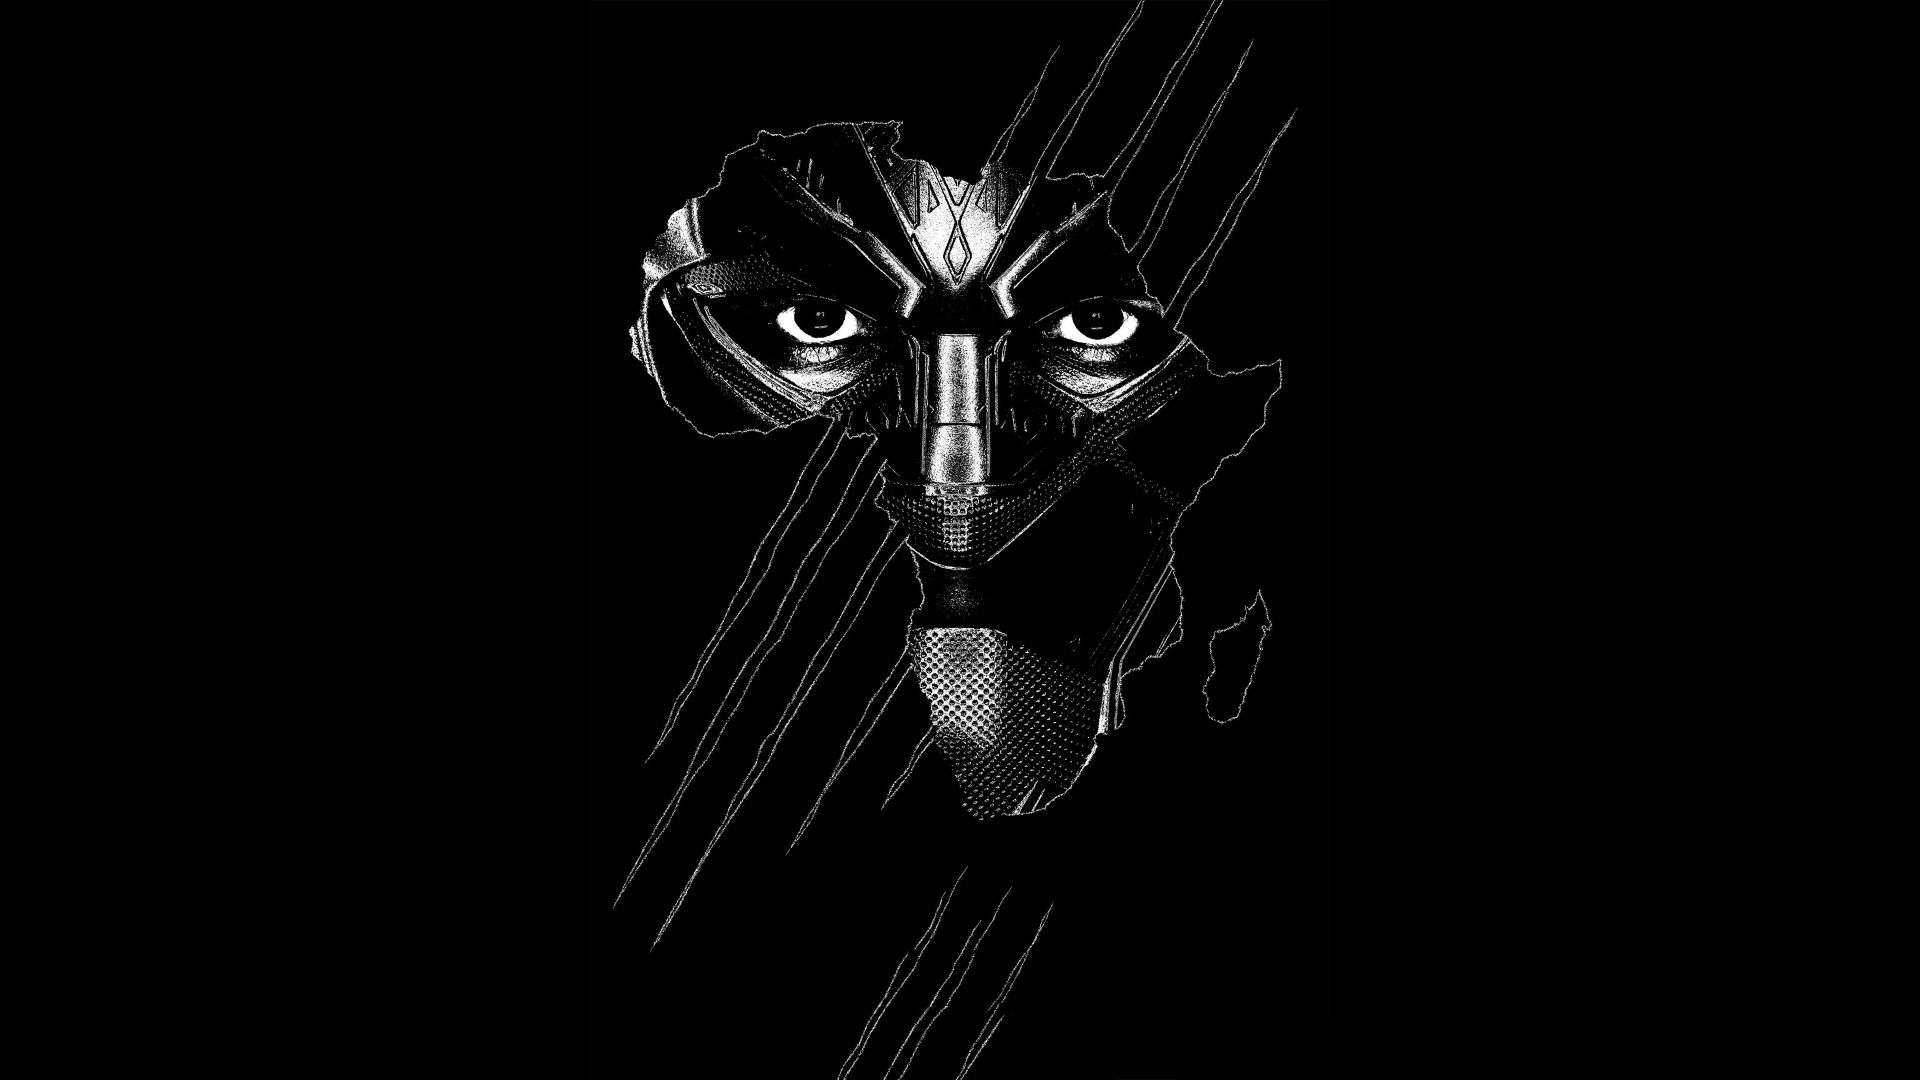 2932x2932 Pubg Android Game 4k Ipad Pro Retina Display Hd: Wallpaper Black Panther, Poster, 4k, Movies #17534